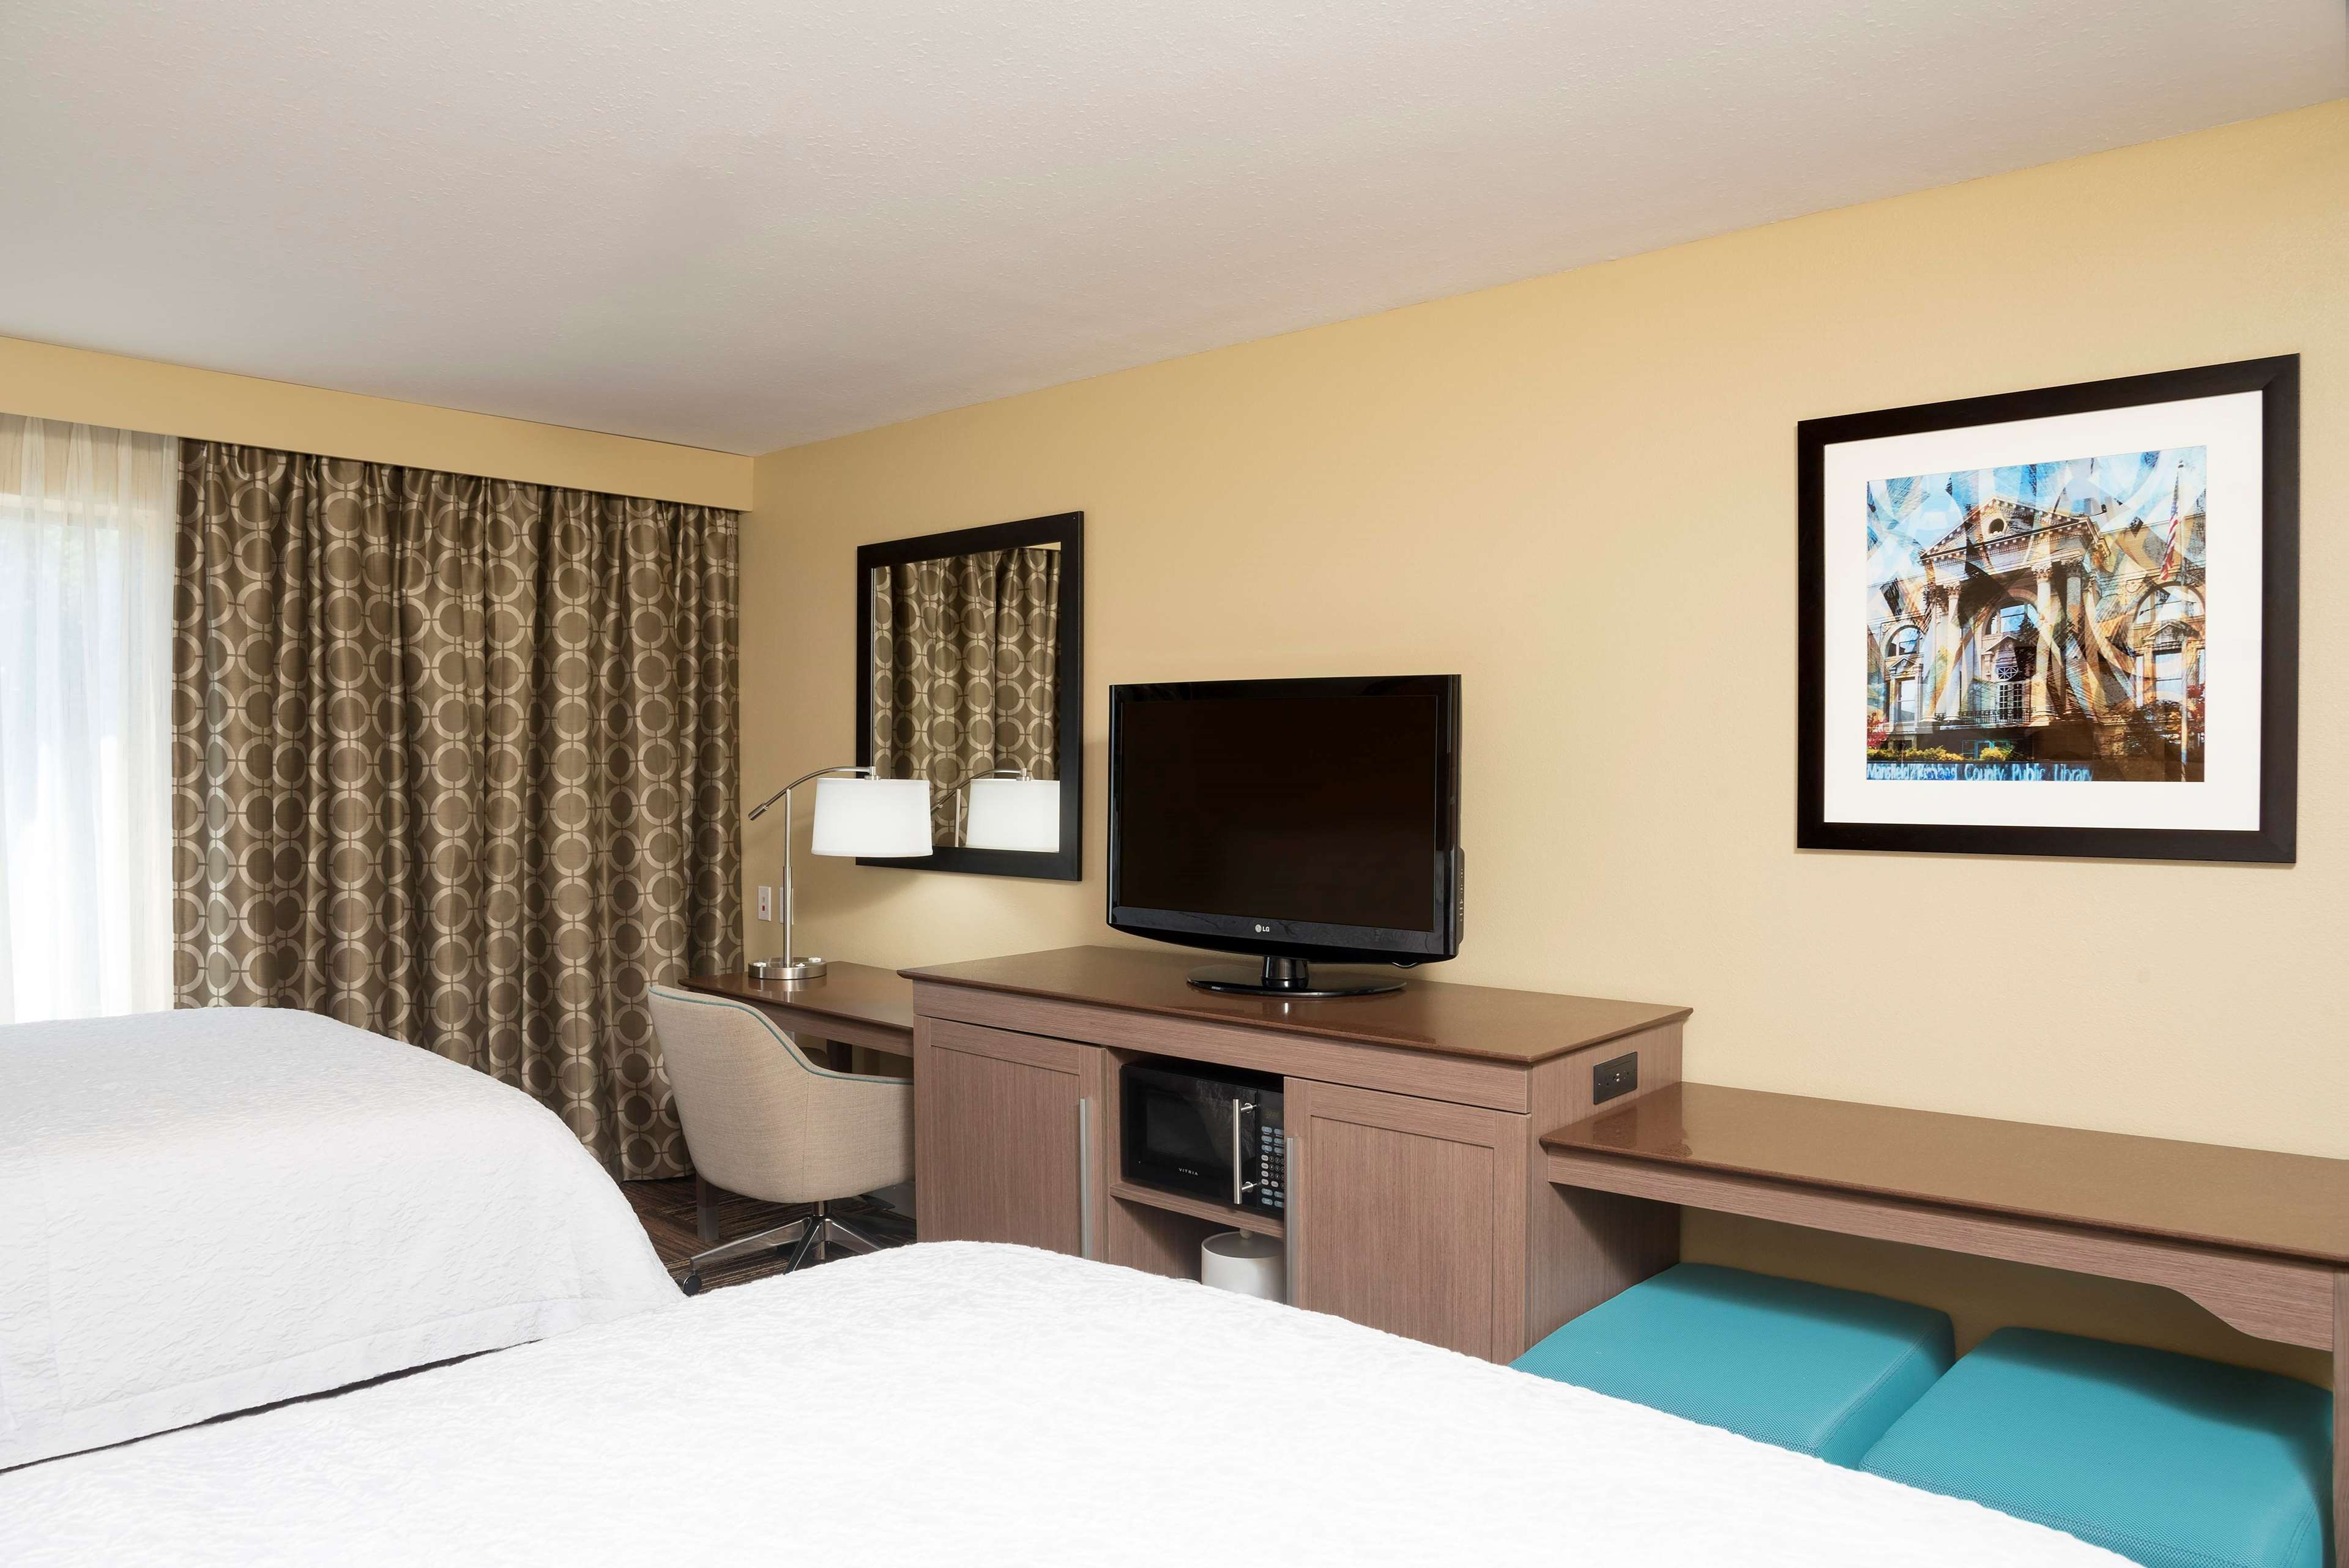 Hampton Inn & Suites Mansfield-South @ I-71 image 29